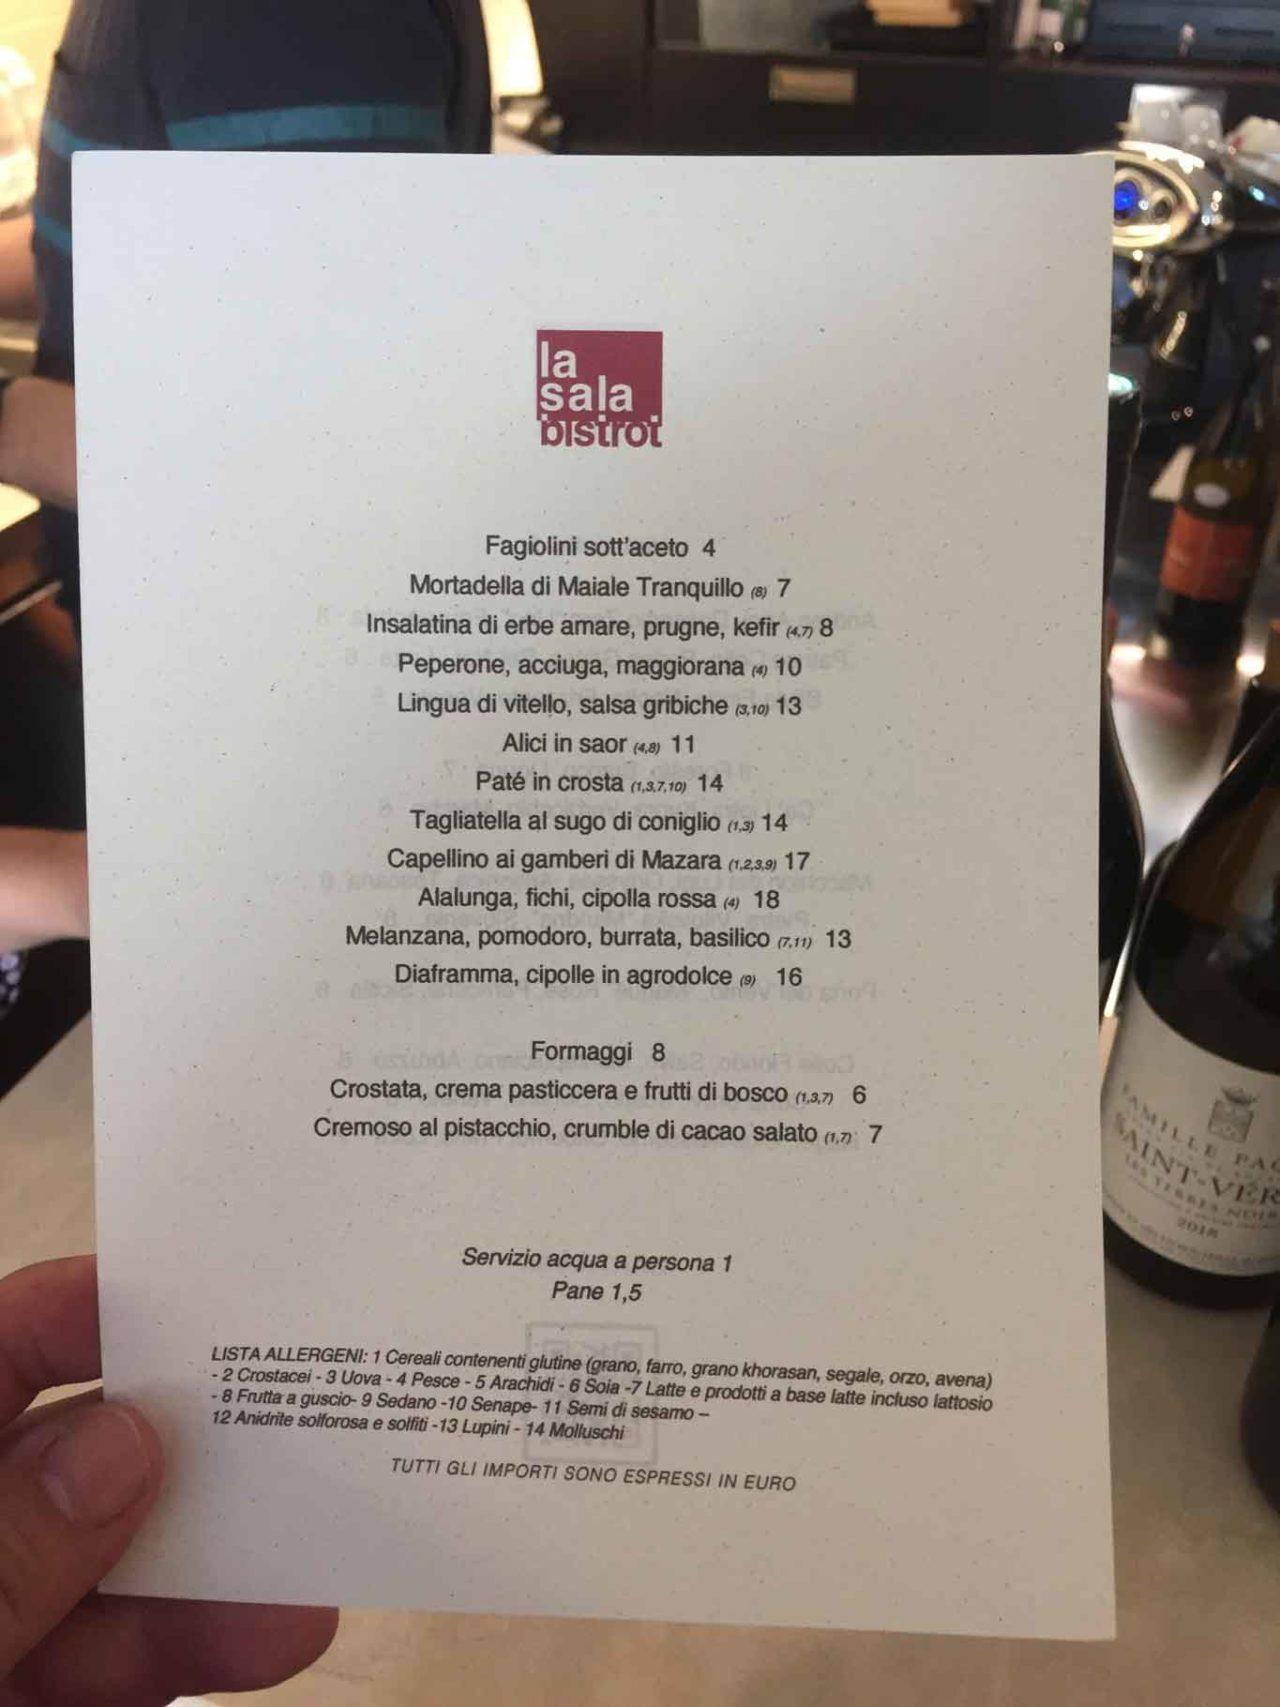 la sala bistrot menu